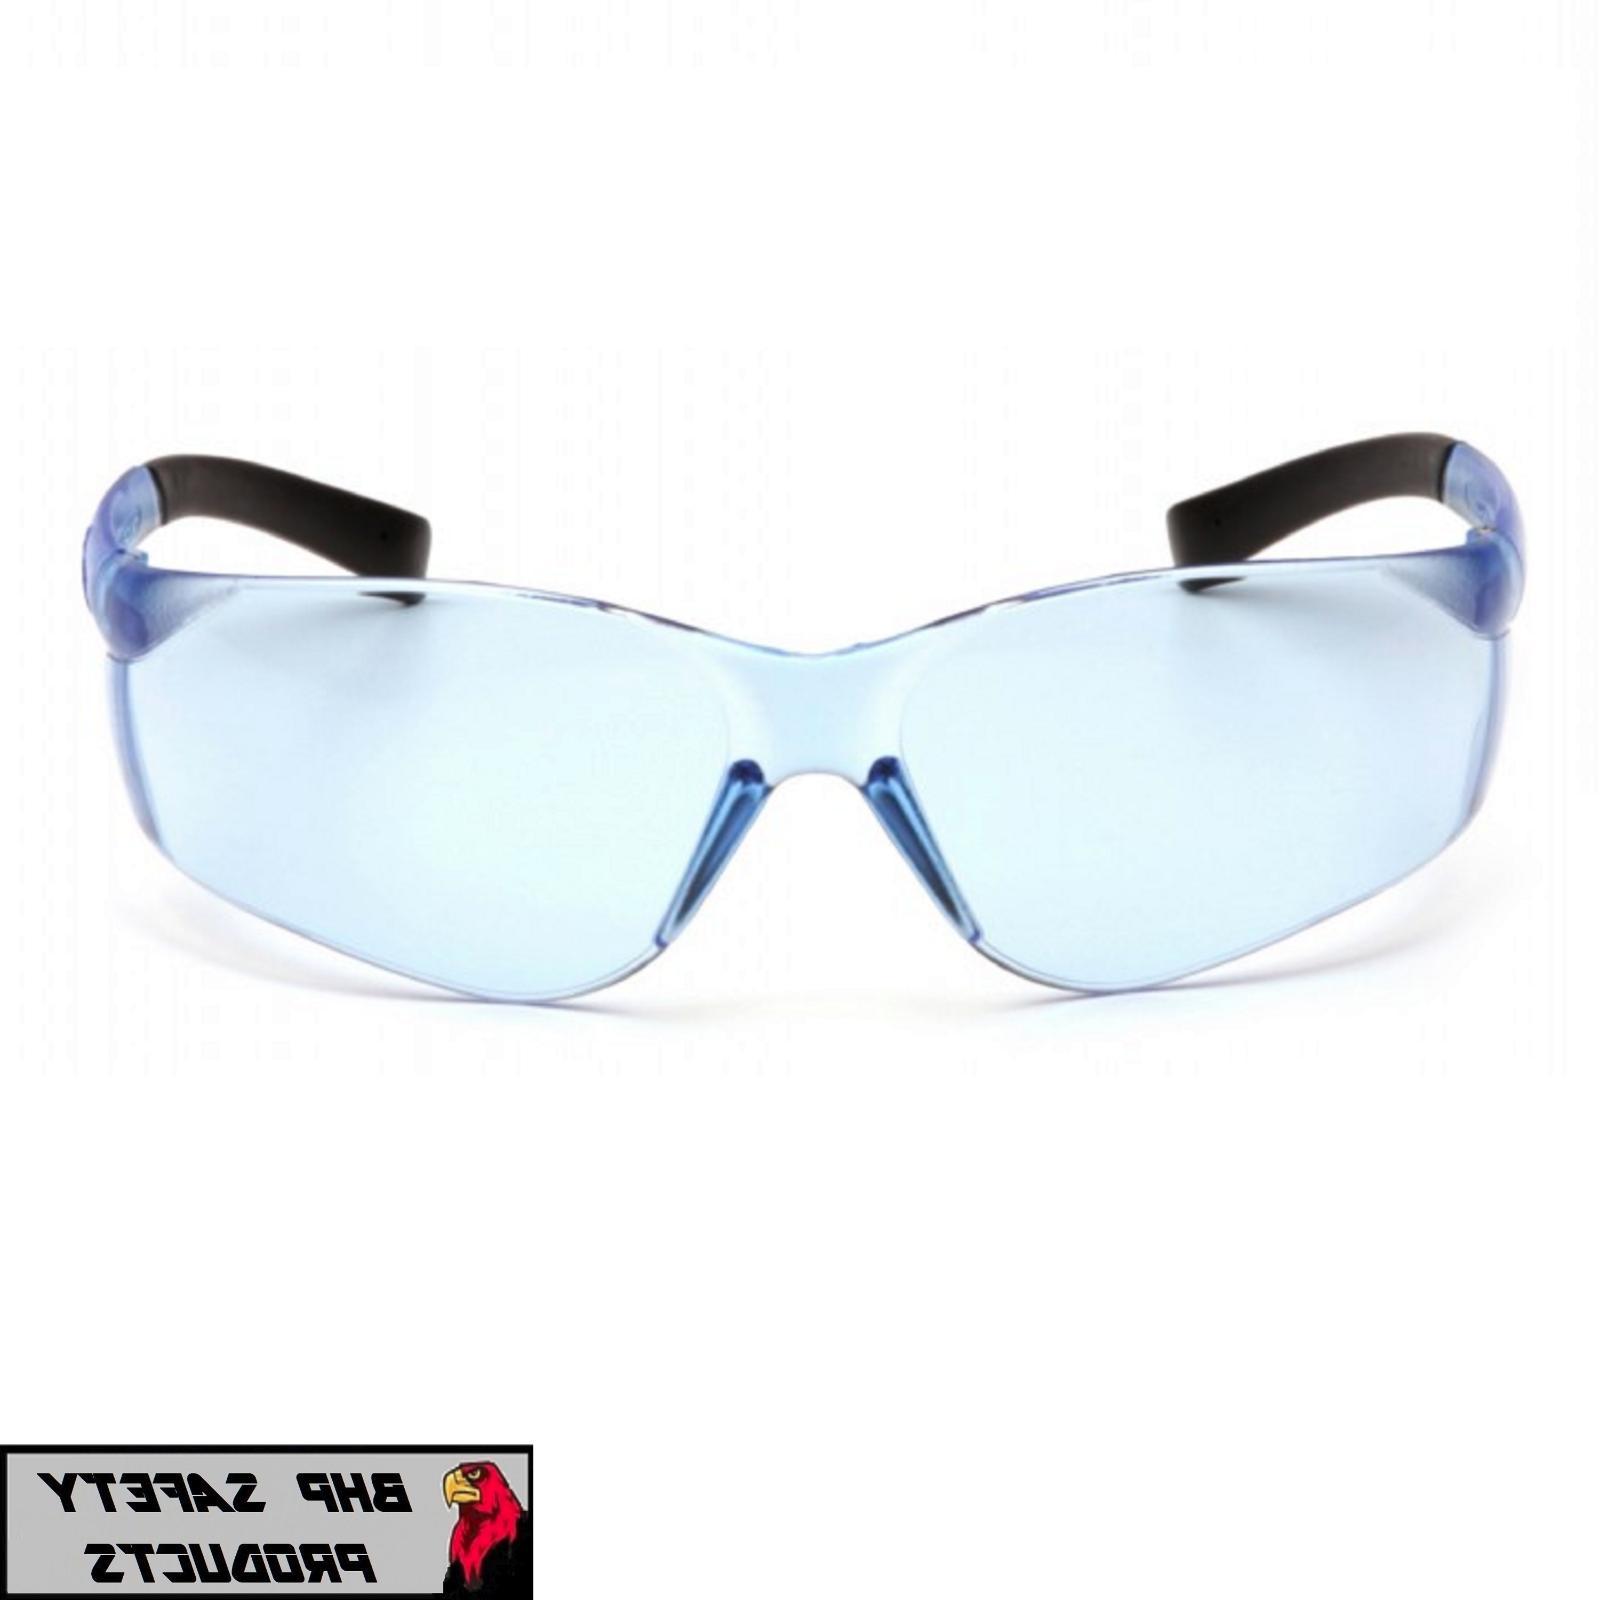 ZTEK SAFETY GLASSES BLUE SPORT EYEWEAR